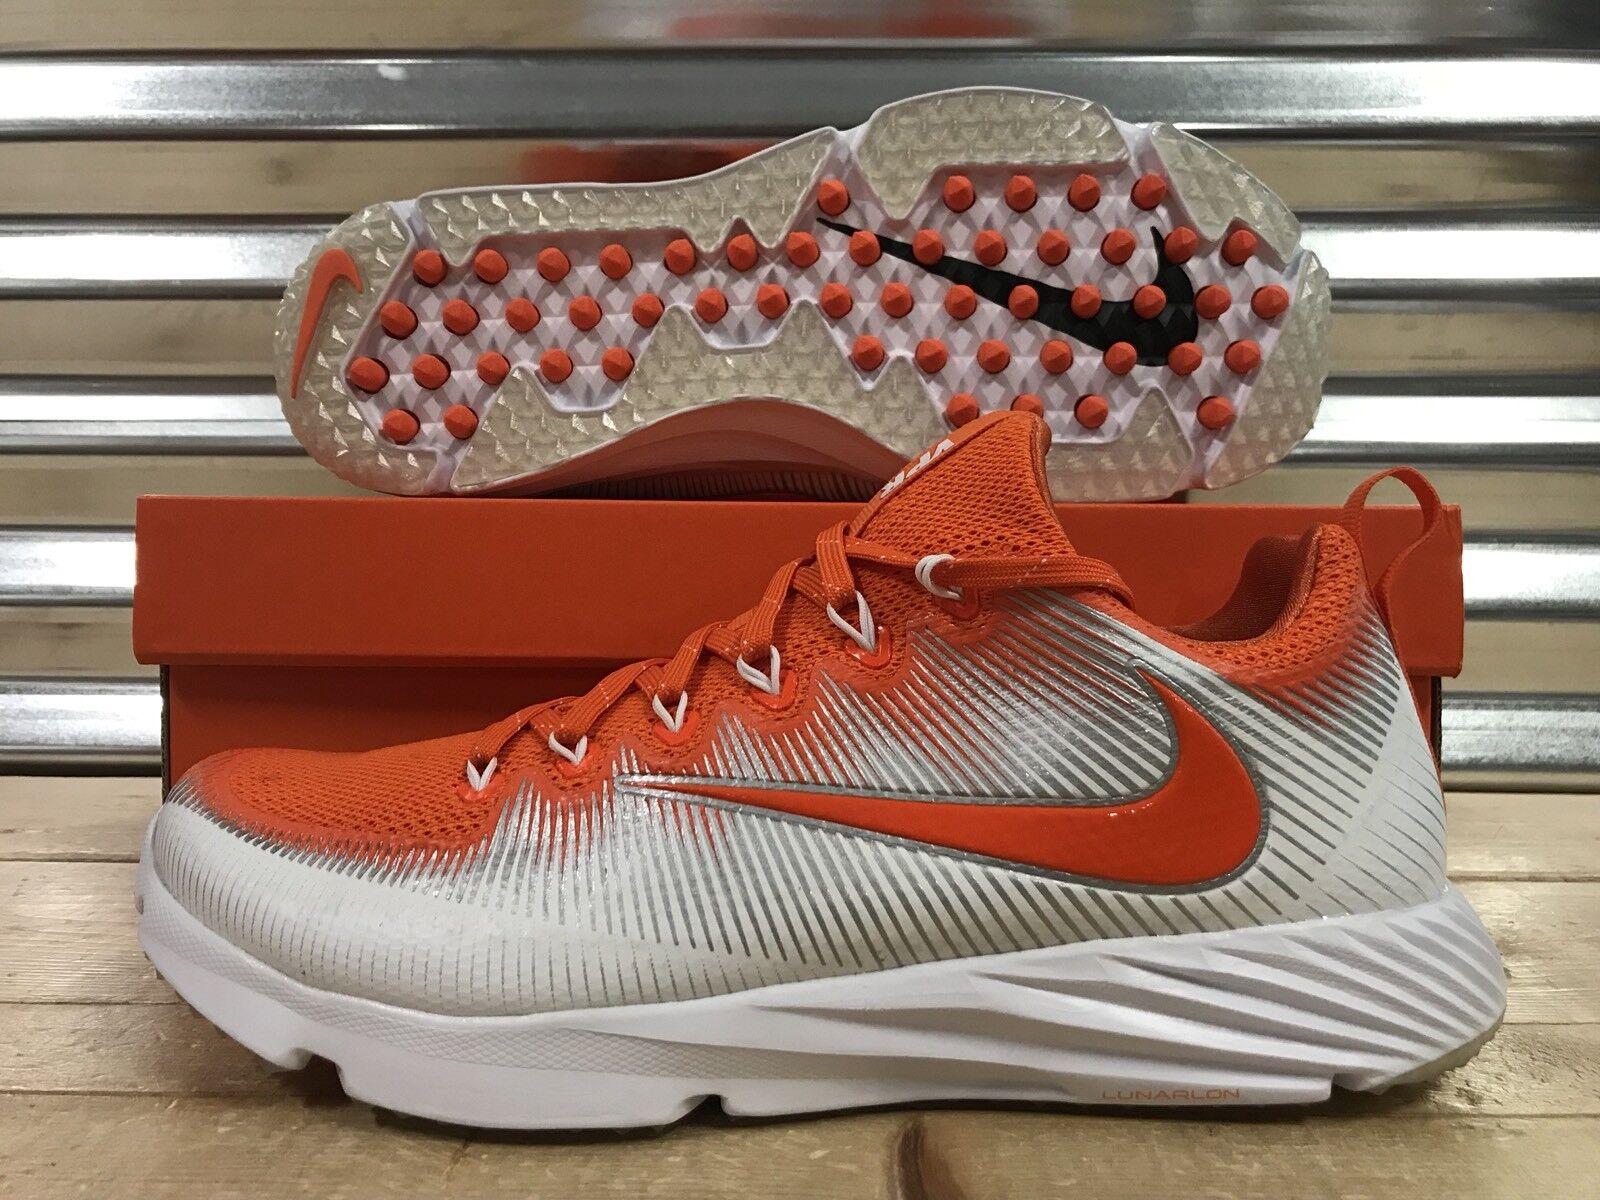 Nike Vapor Speed Turf Football LAX Trainers Orange White Clemson ( 848334-882 )